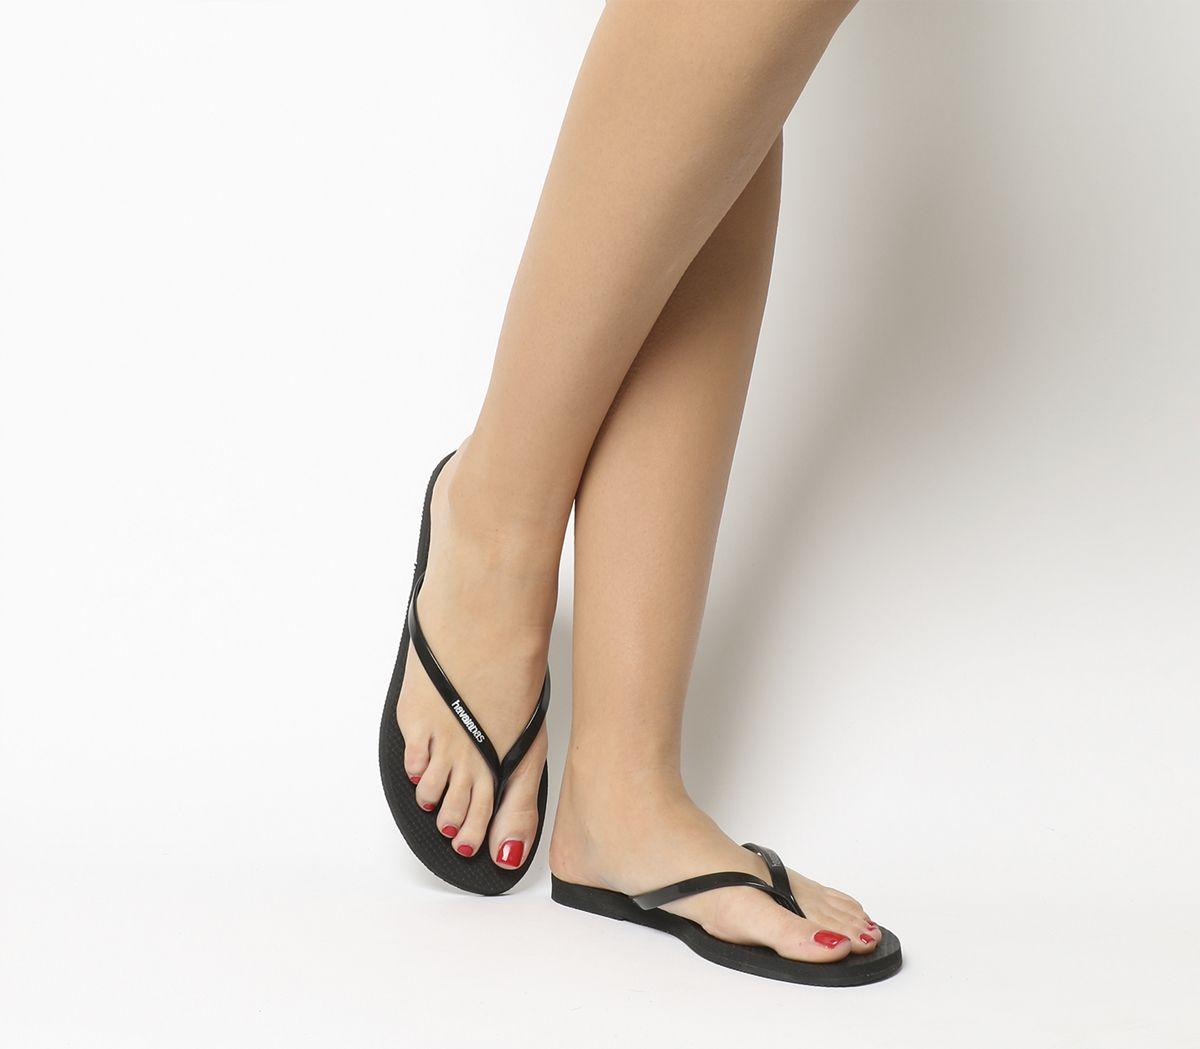 09a81748c Havaianas Slim You Metallic Flip Flops Black - Sandals